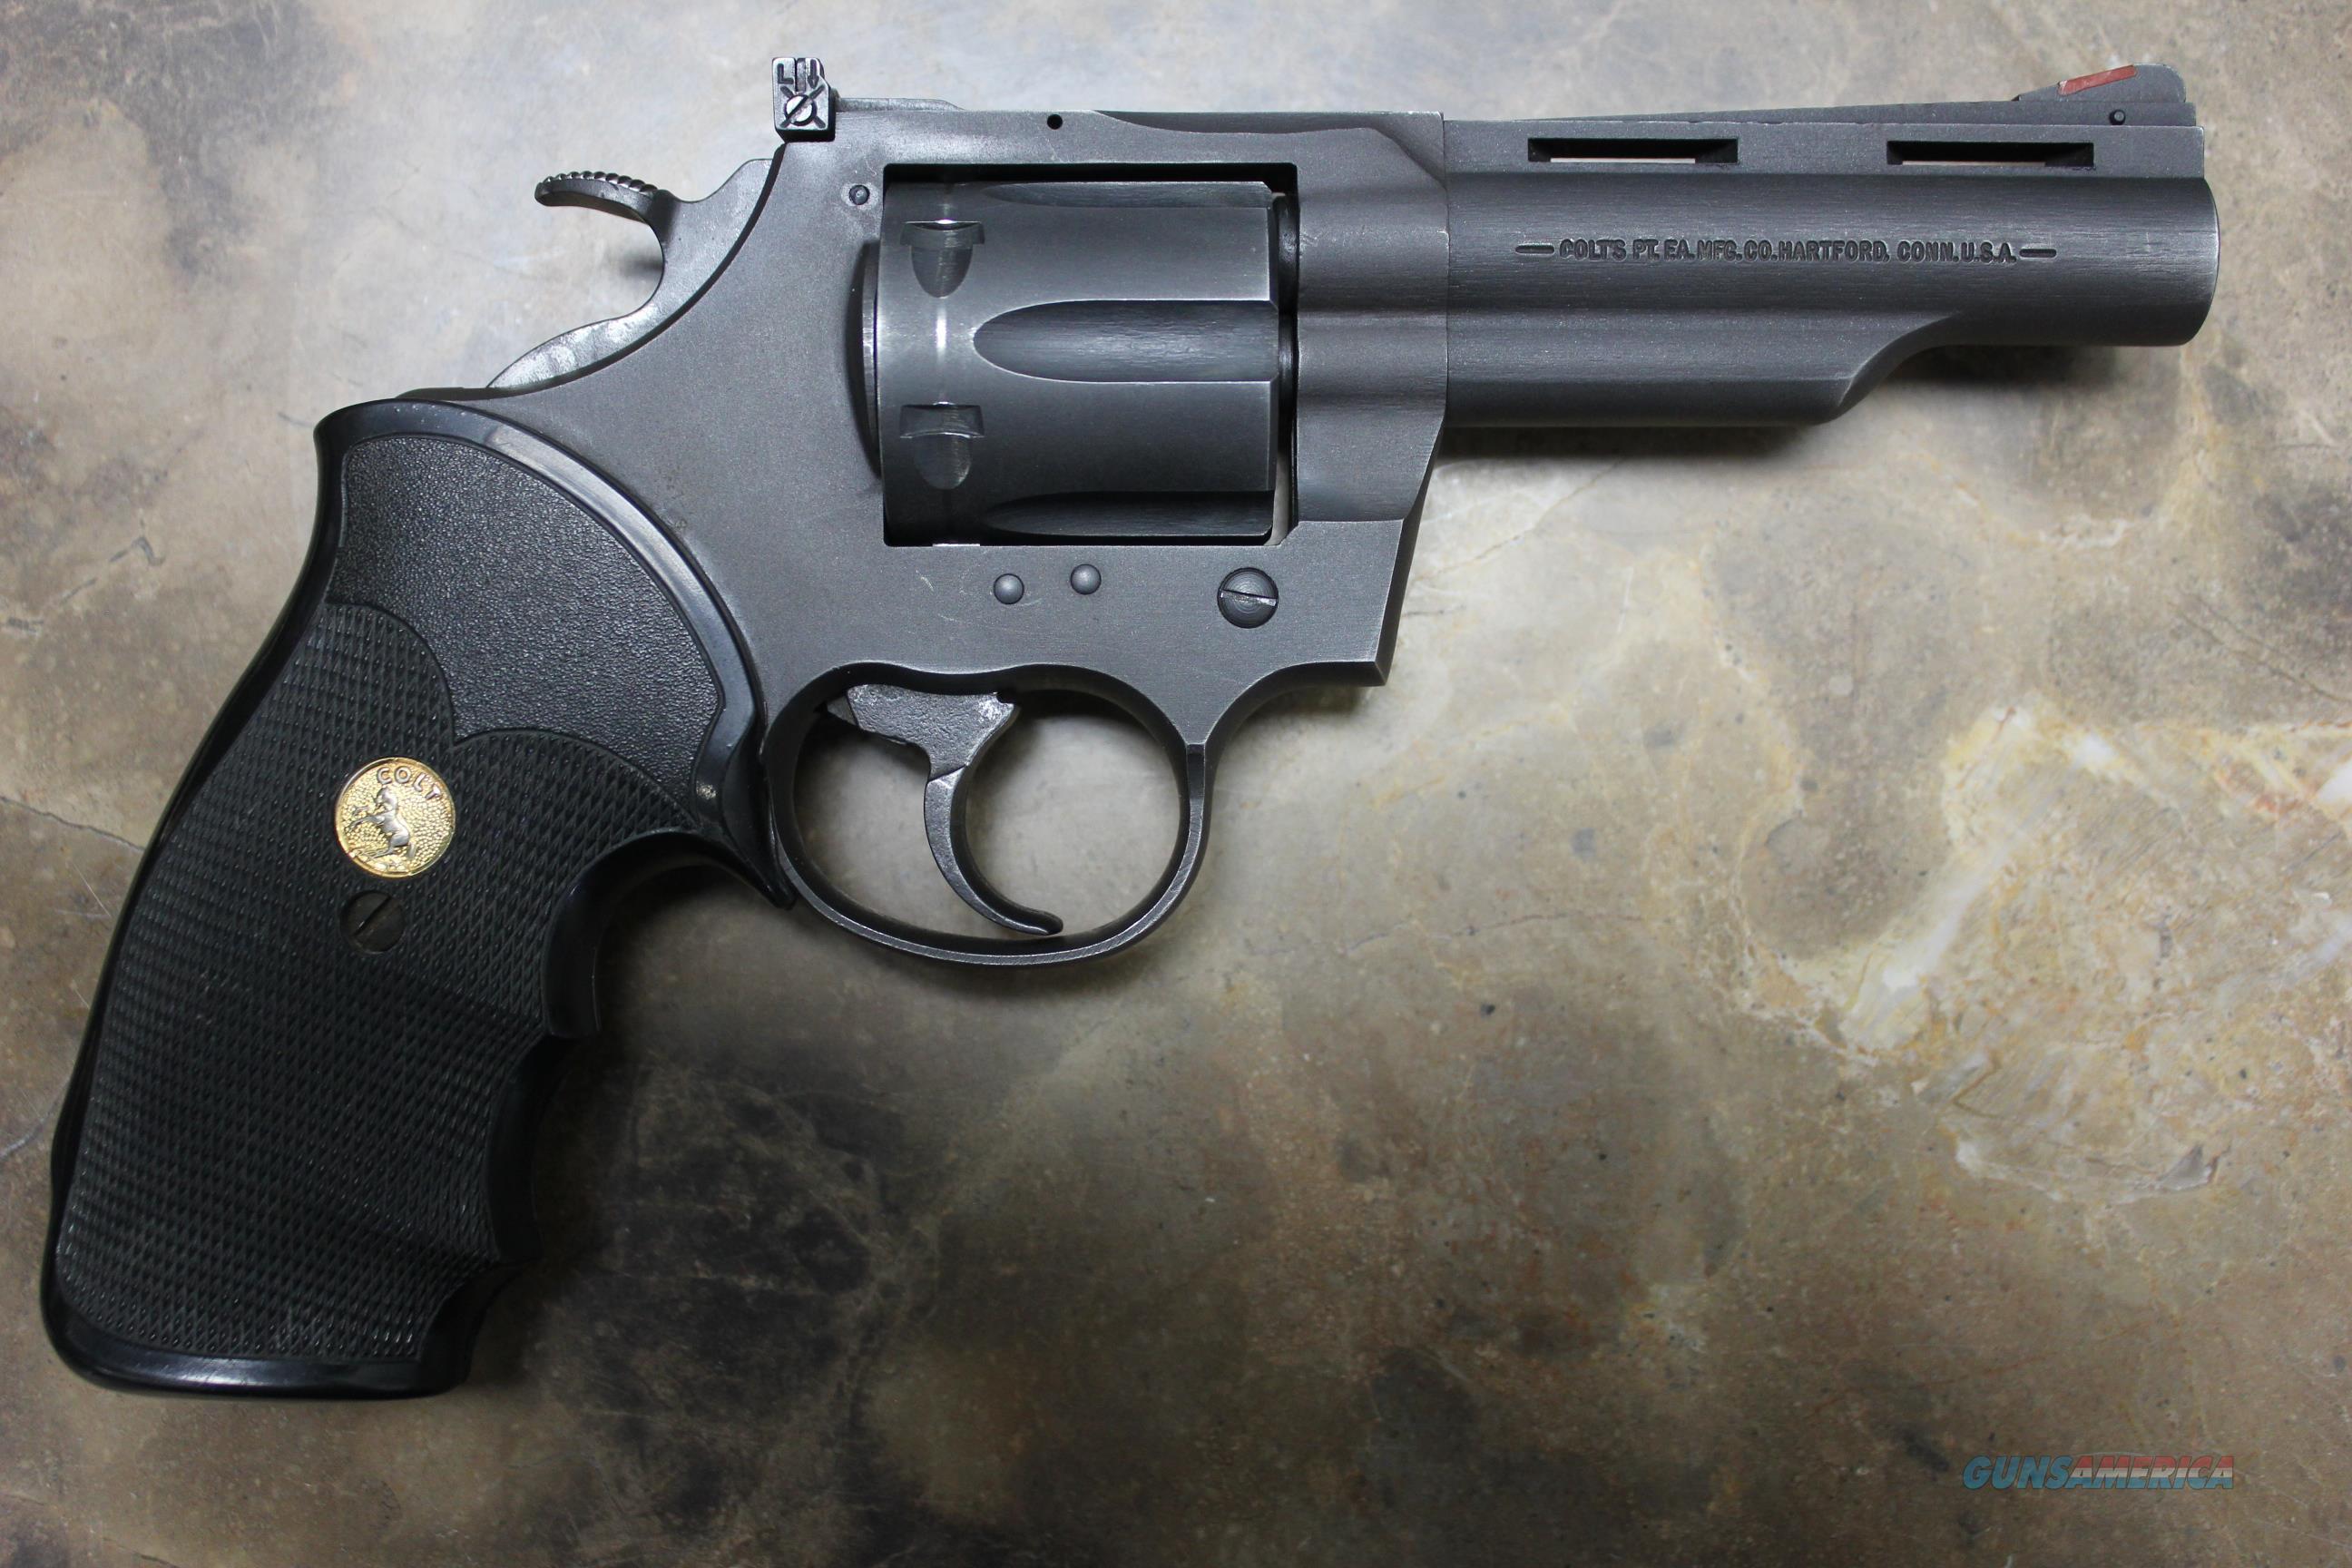 Colt Peacekeeper .357 Magnum 6 Shot  Guns > Pistols > Colt Double Action Revolvers- Modern